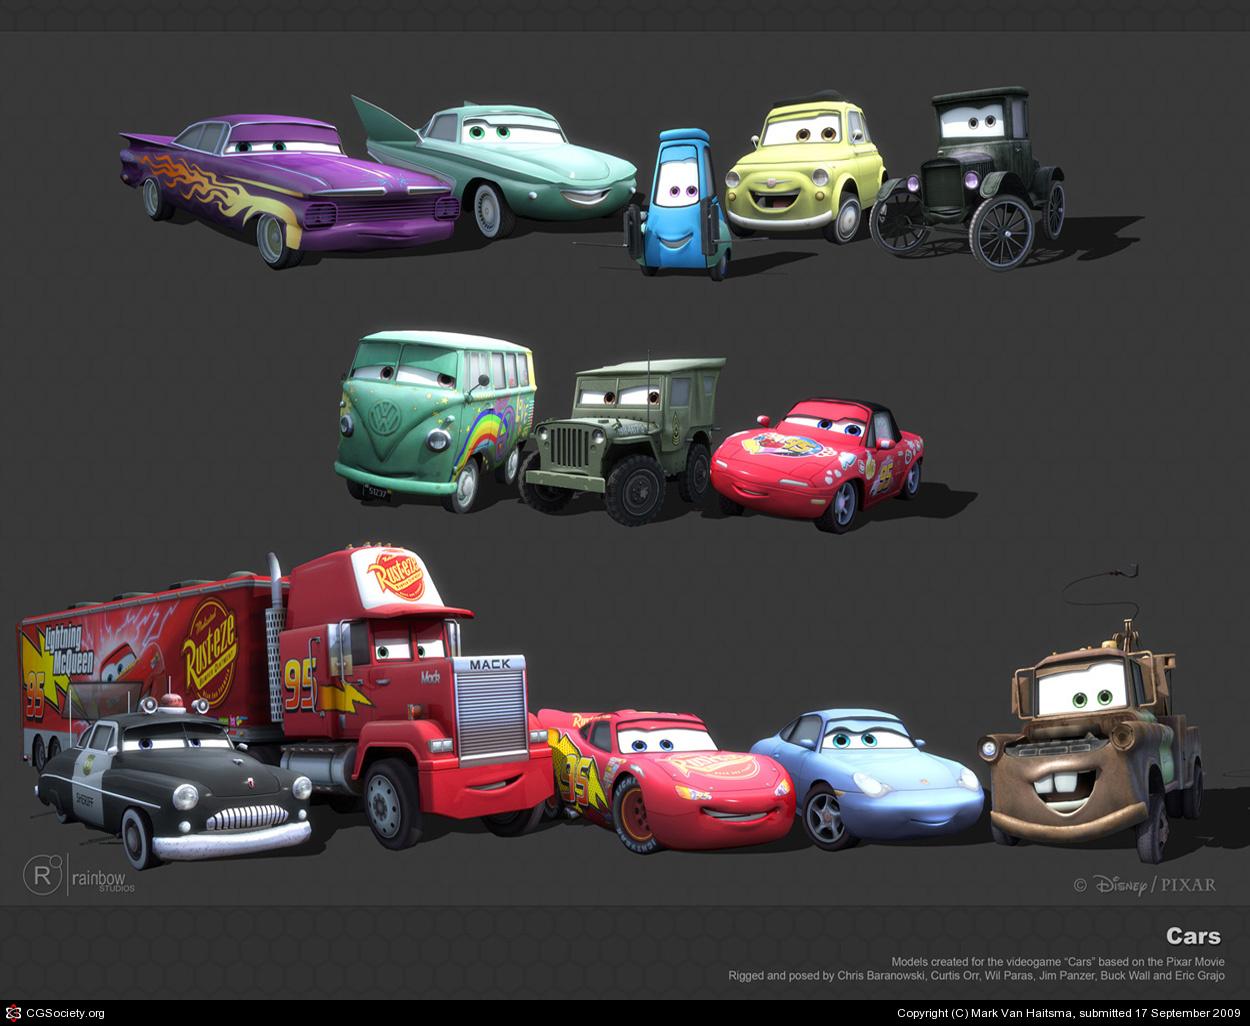 Sonny Cars Video Game